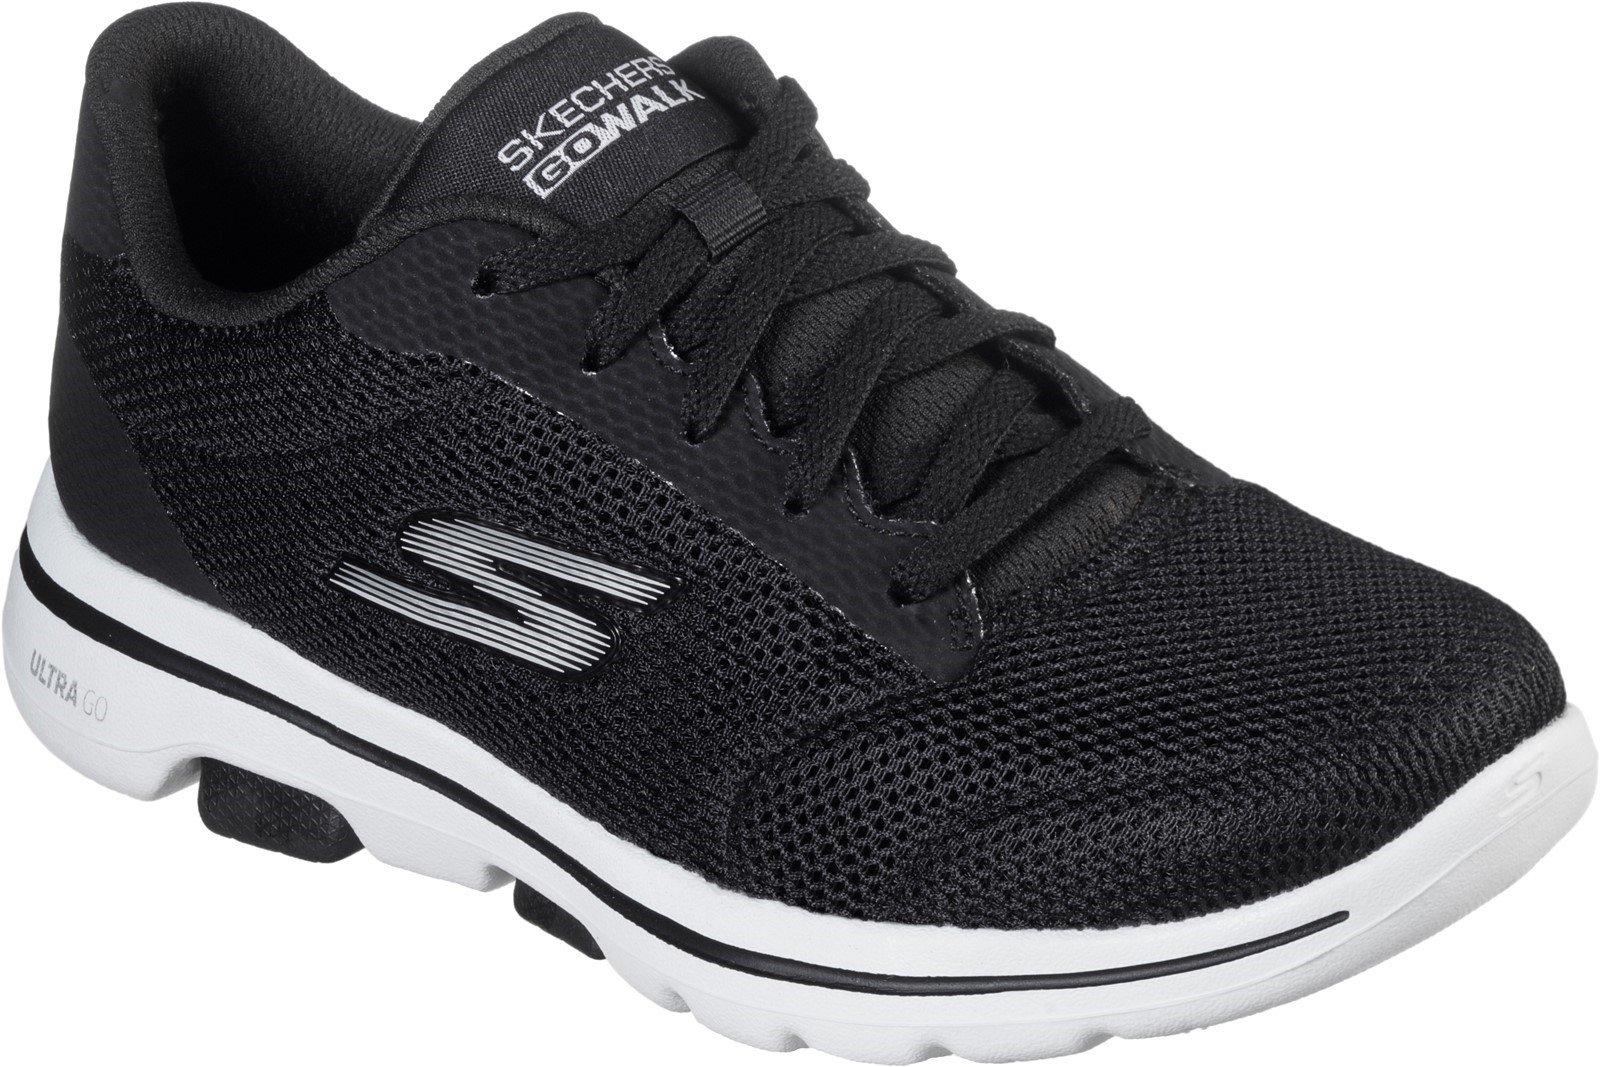 Skechers Women's Gowalk 5 Lucky Sports Trainer Various Colours 31033 - Black/White 3